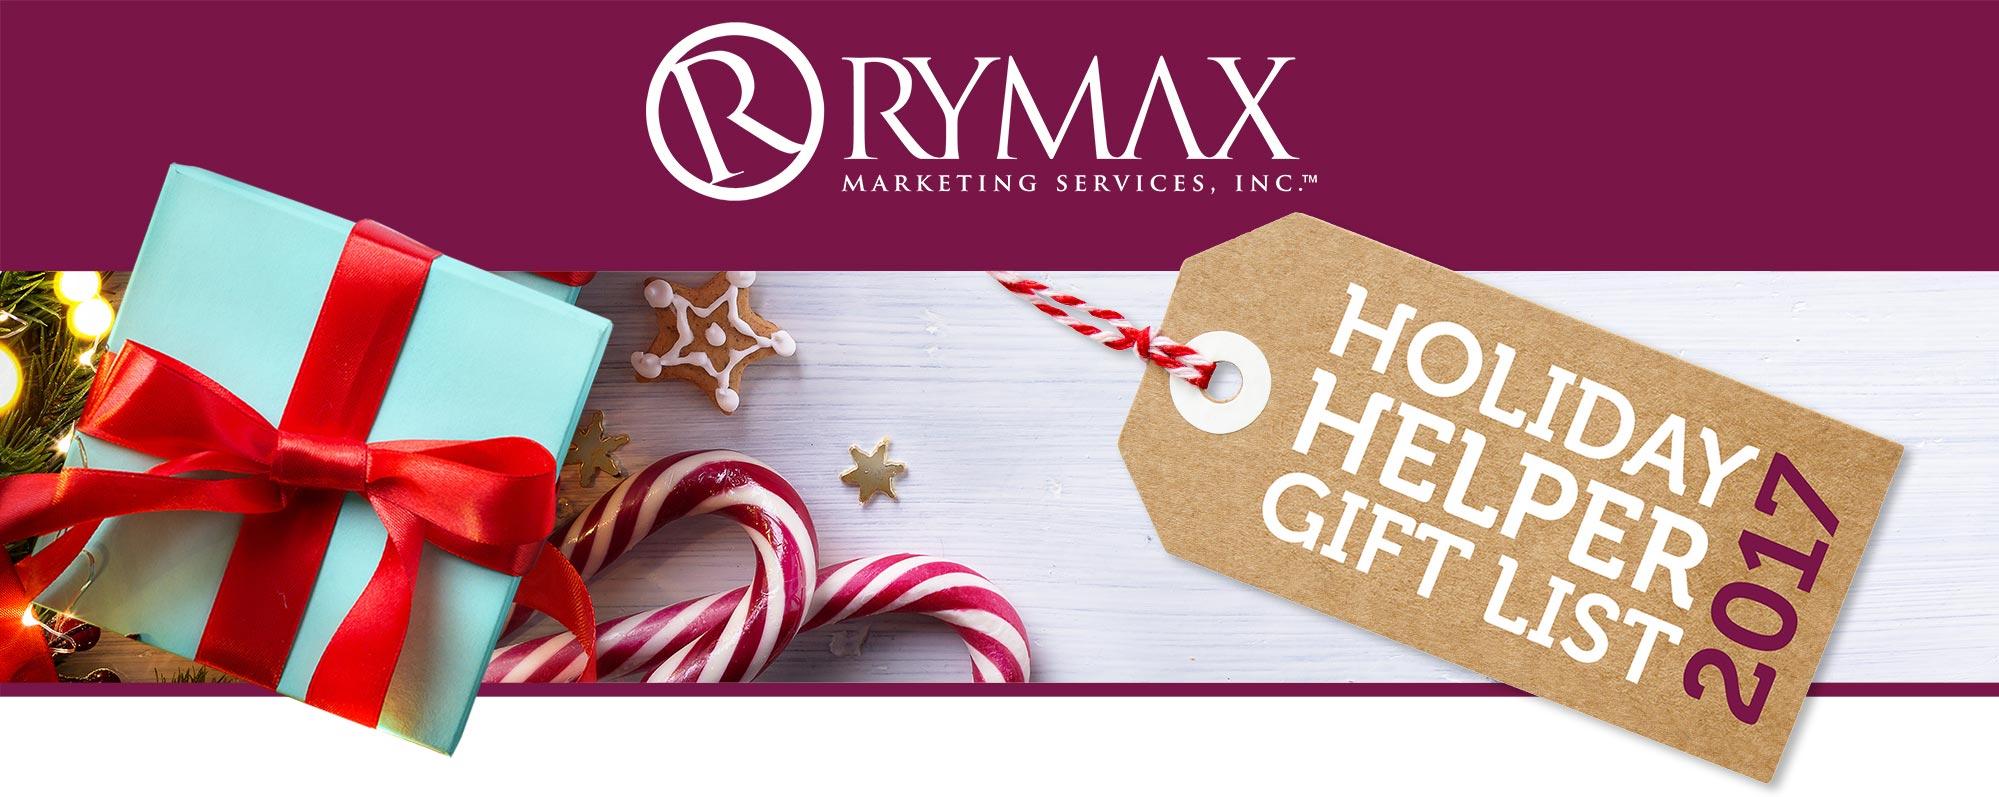 Rymax Holiday Helper Gift List 2017